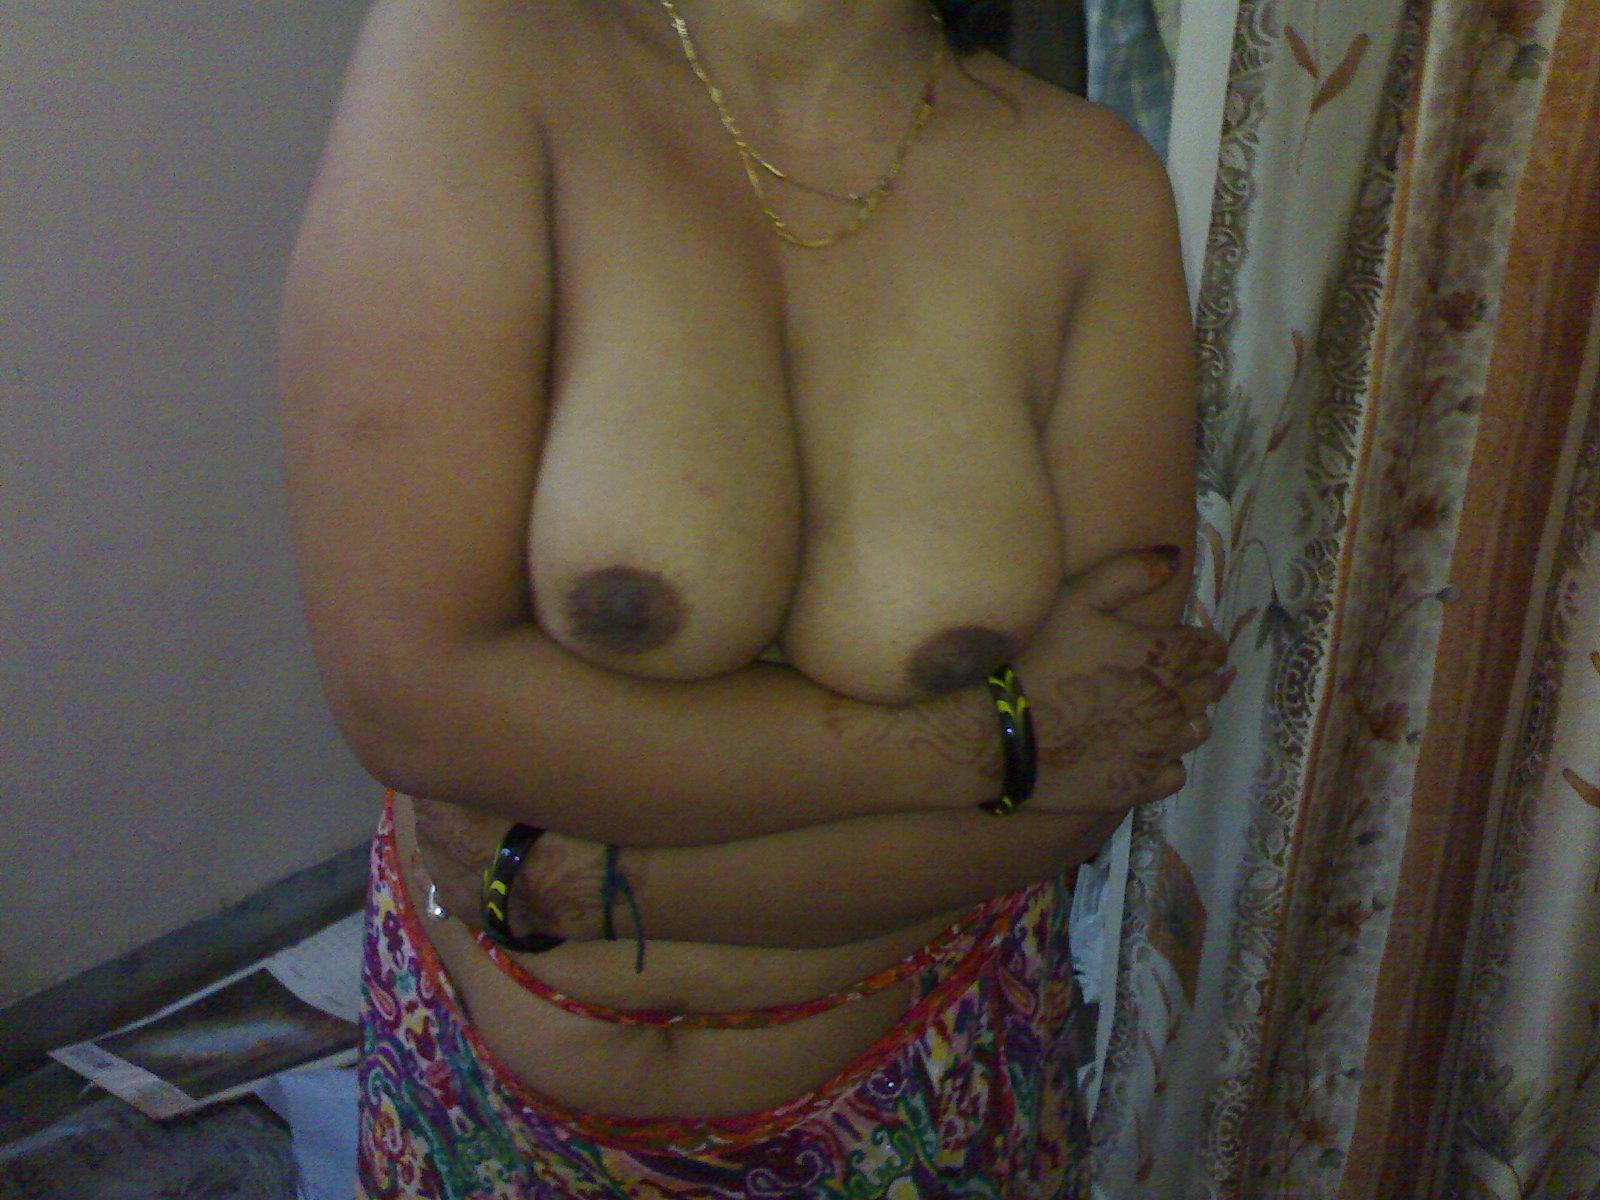 aunt strip